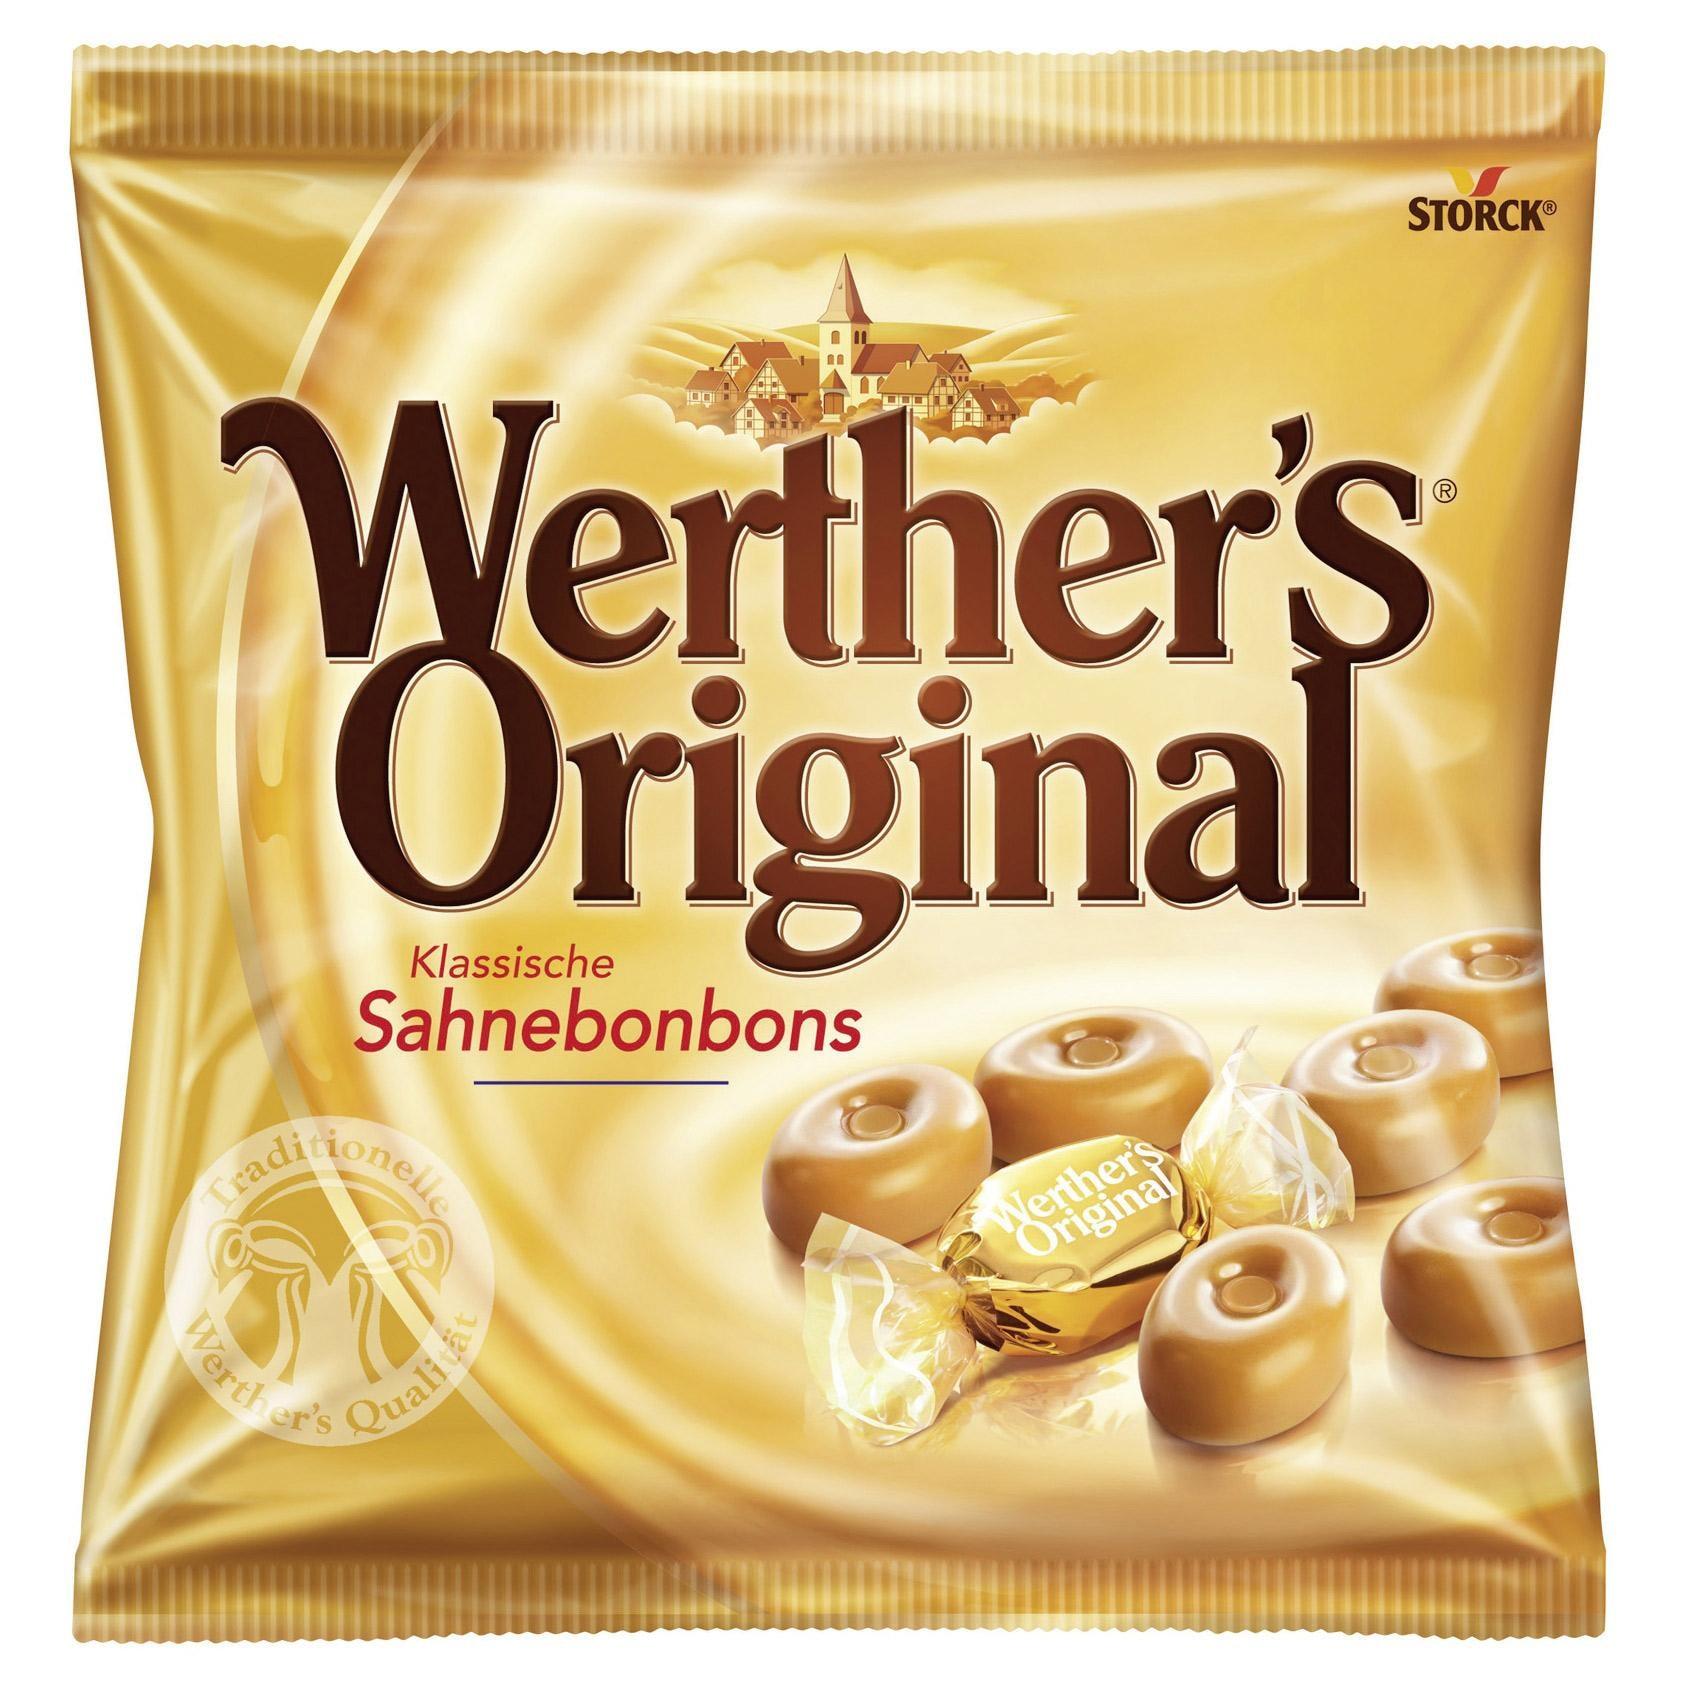 Werther's Original - Karamellbonbons - 120g